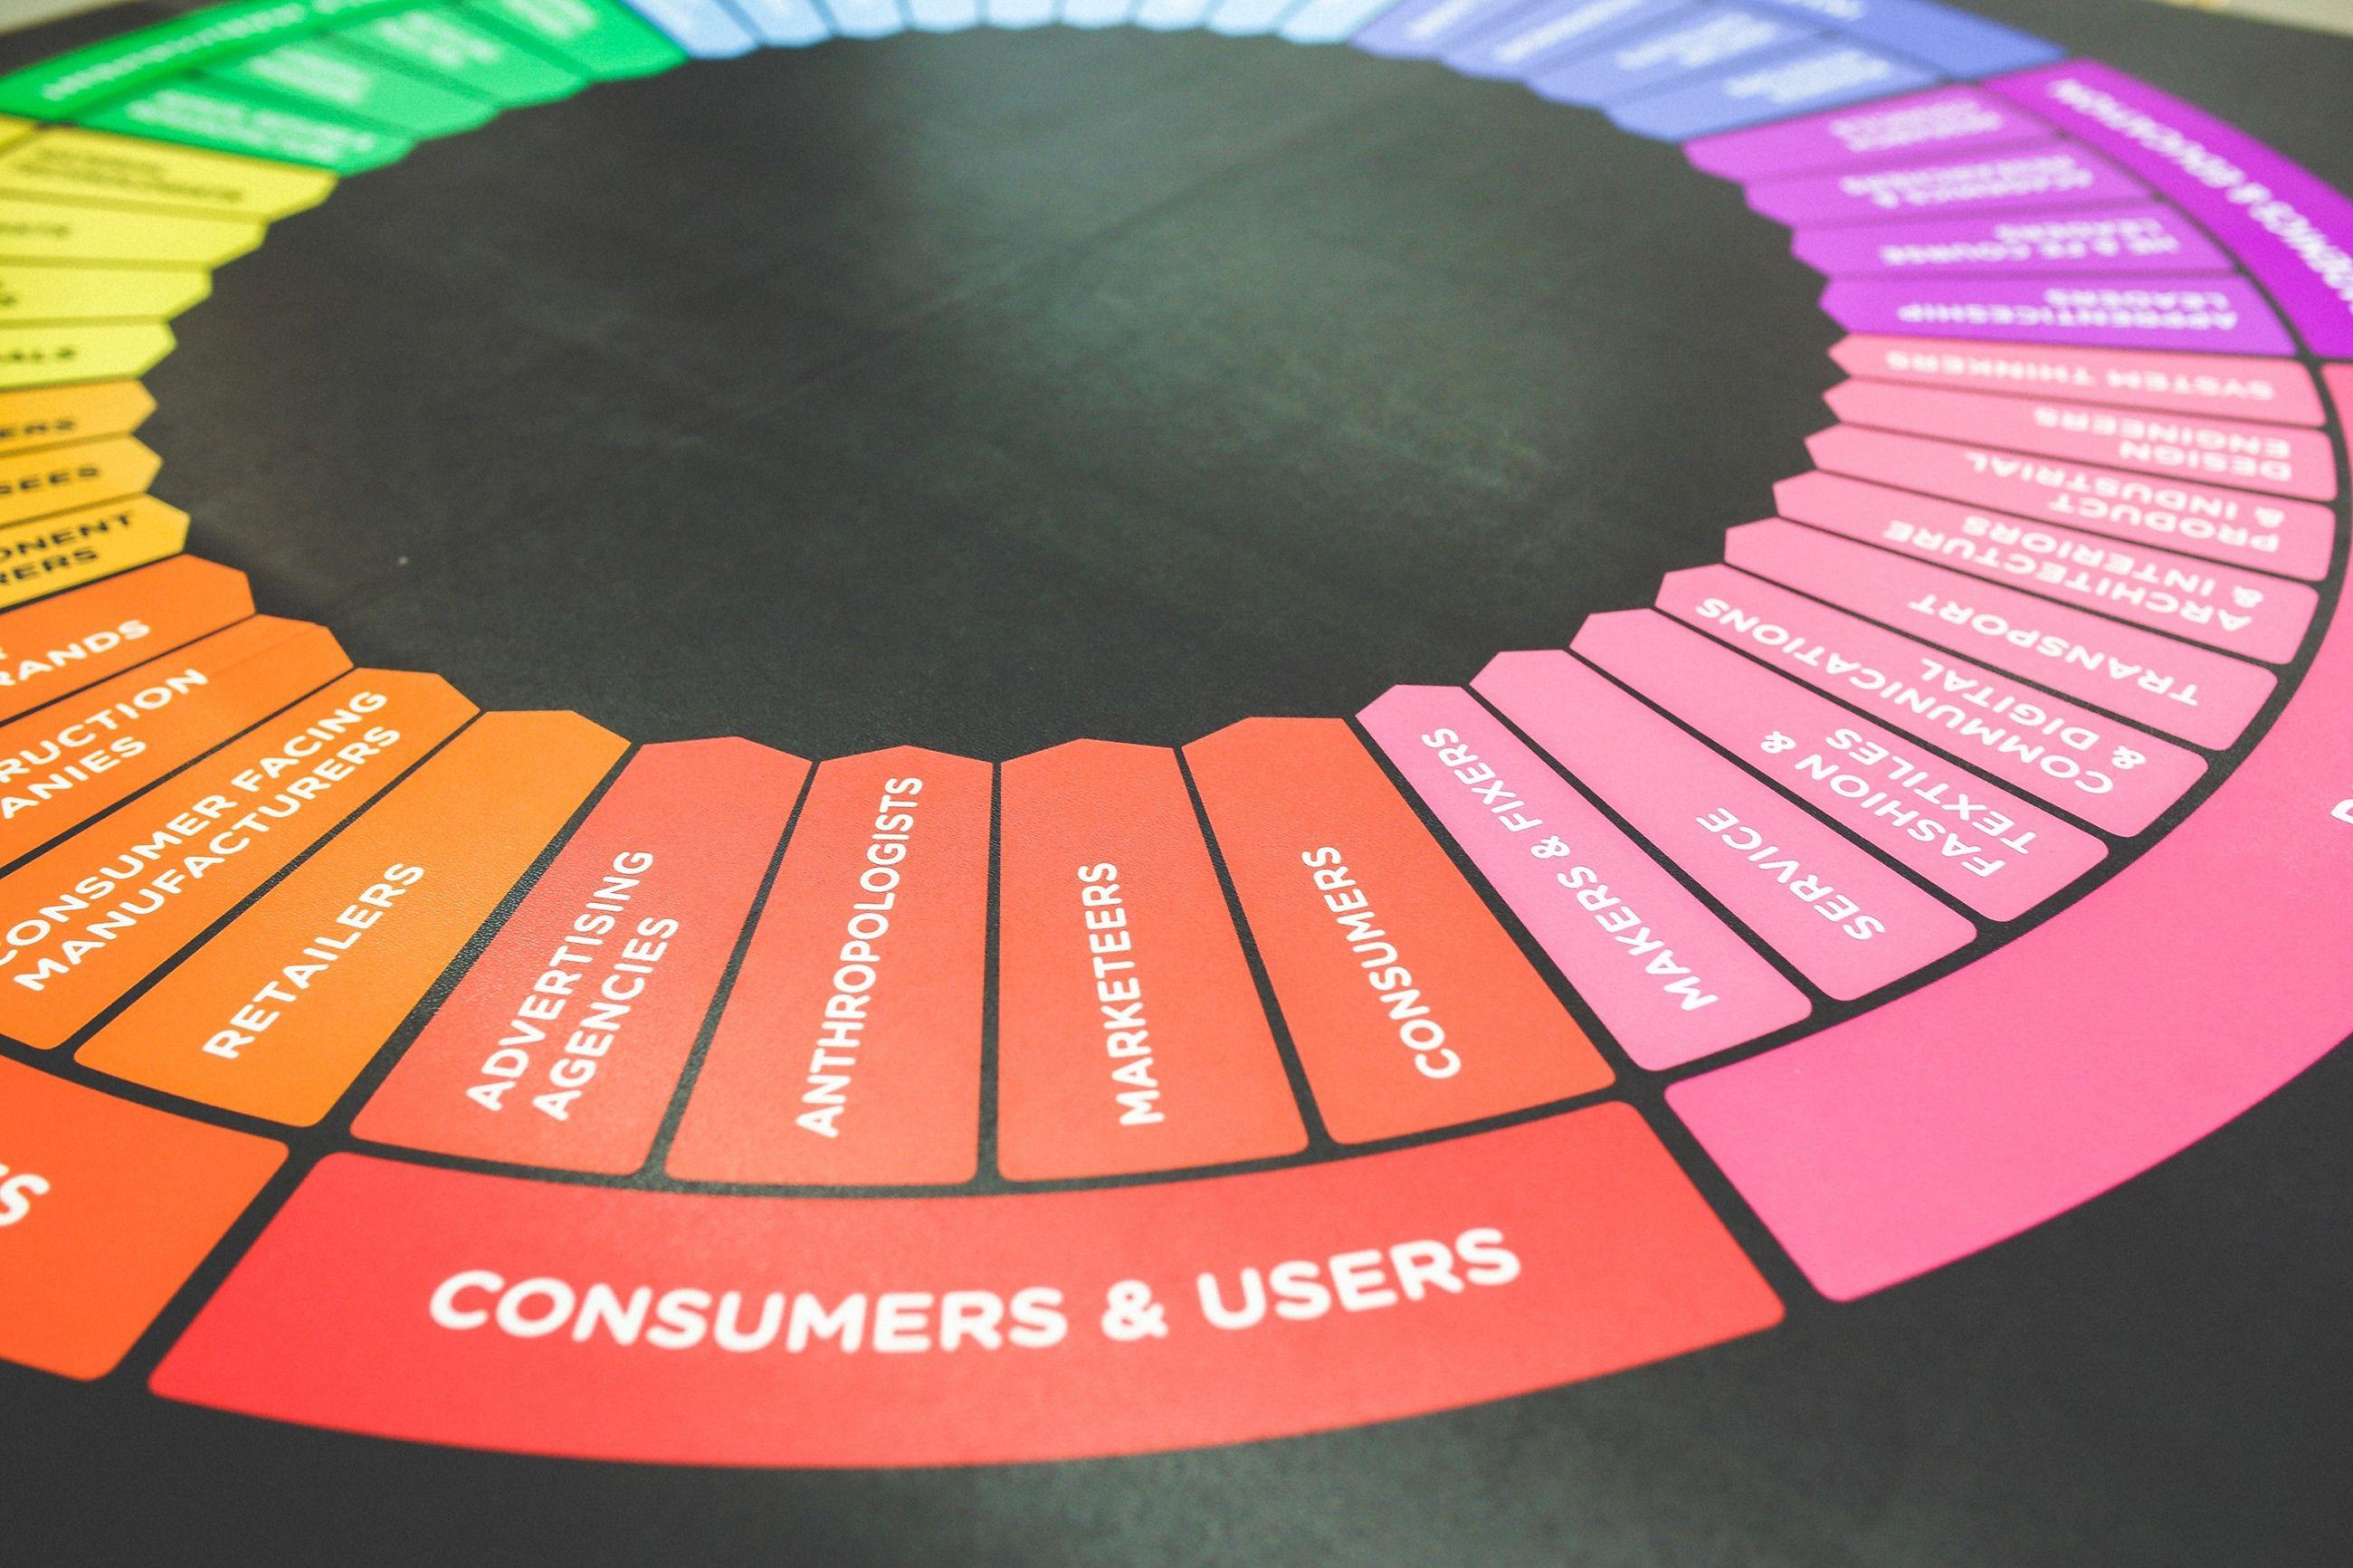 customers-users-color-wheel